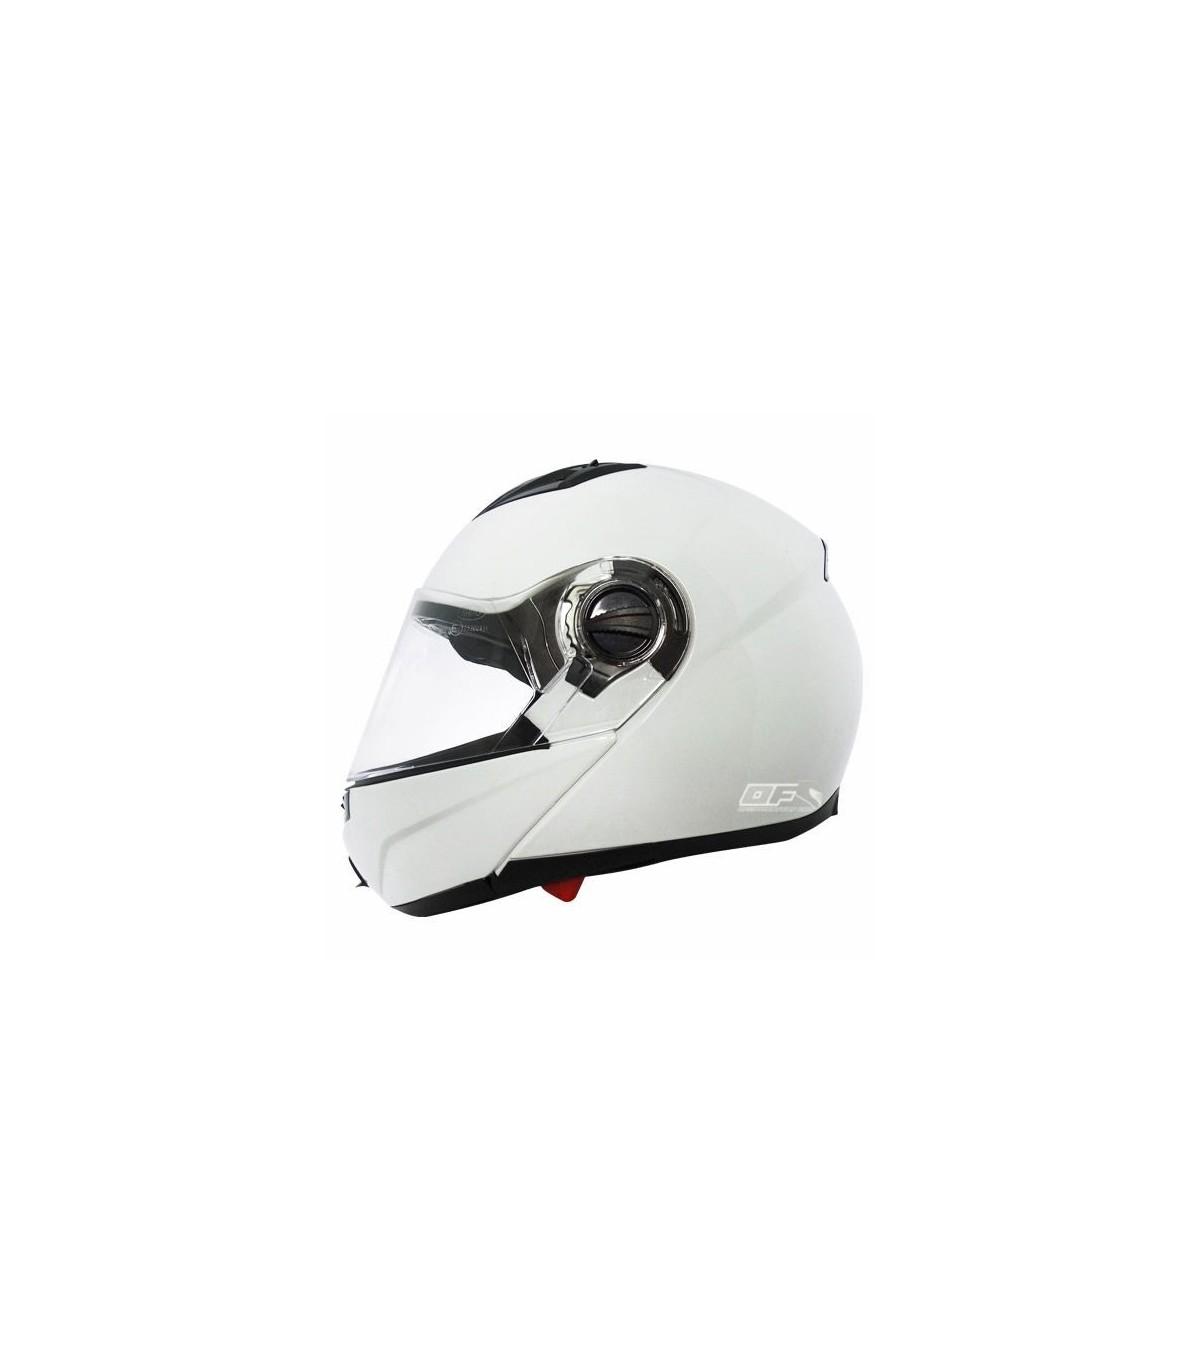 8e25d995 Casco Shiro SH-500 BIKER Monocolor Blanco